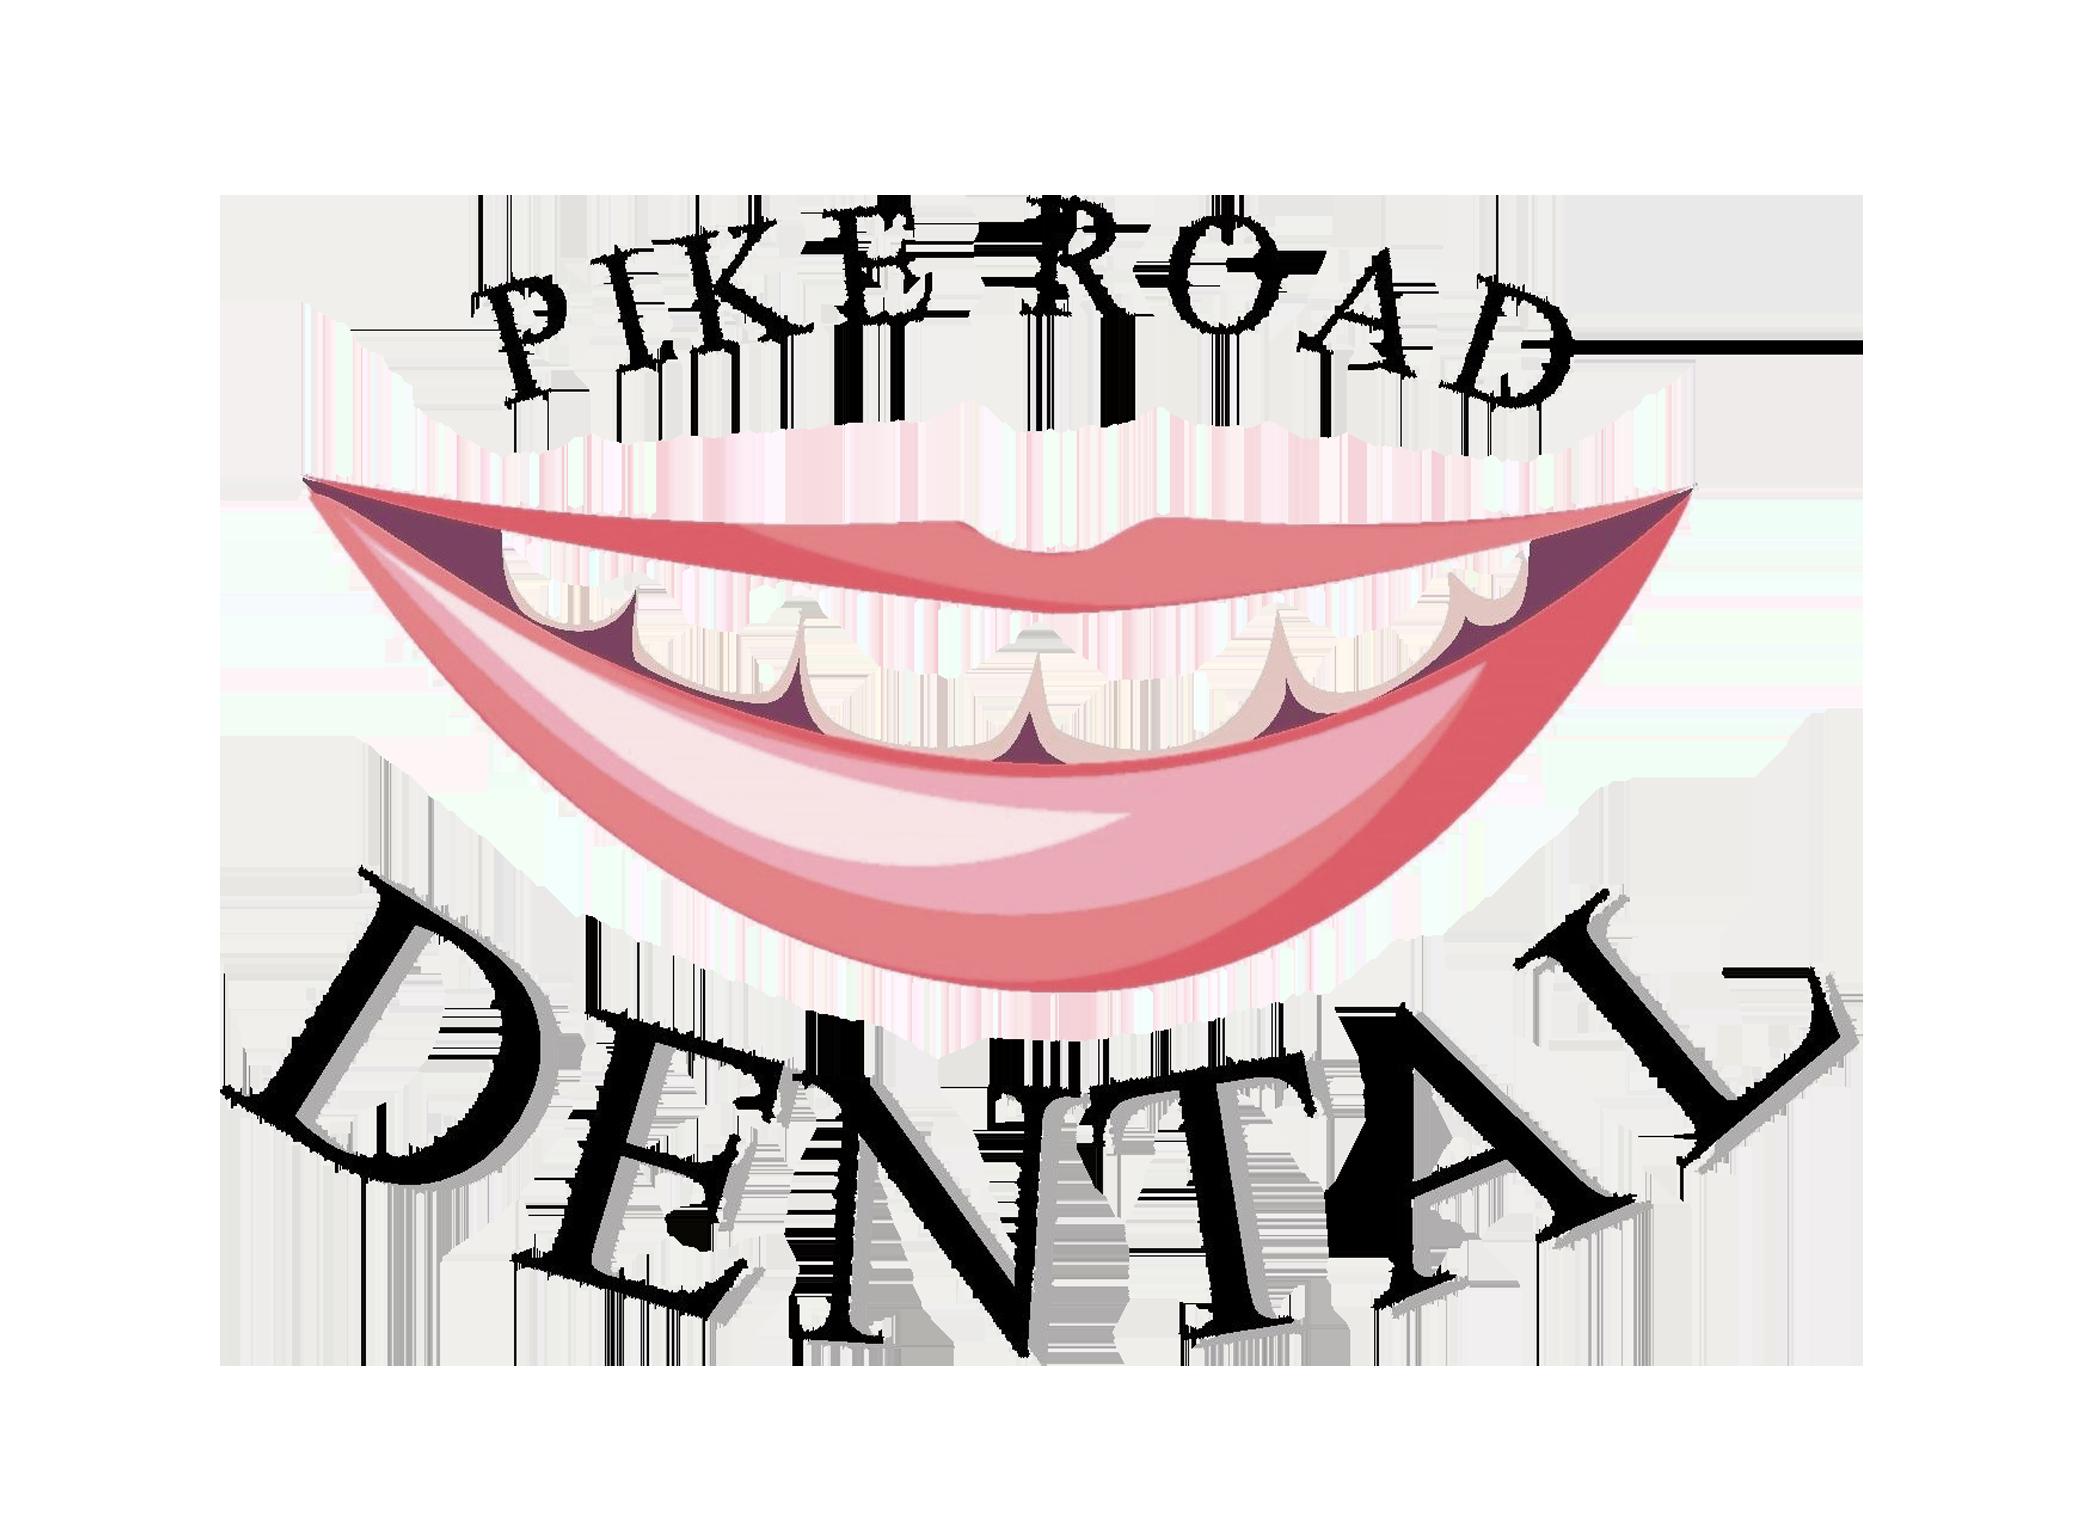 Pike Road Dental